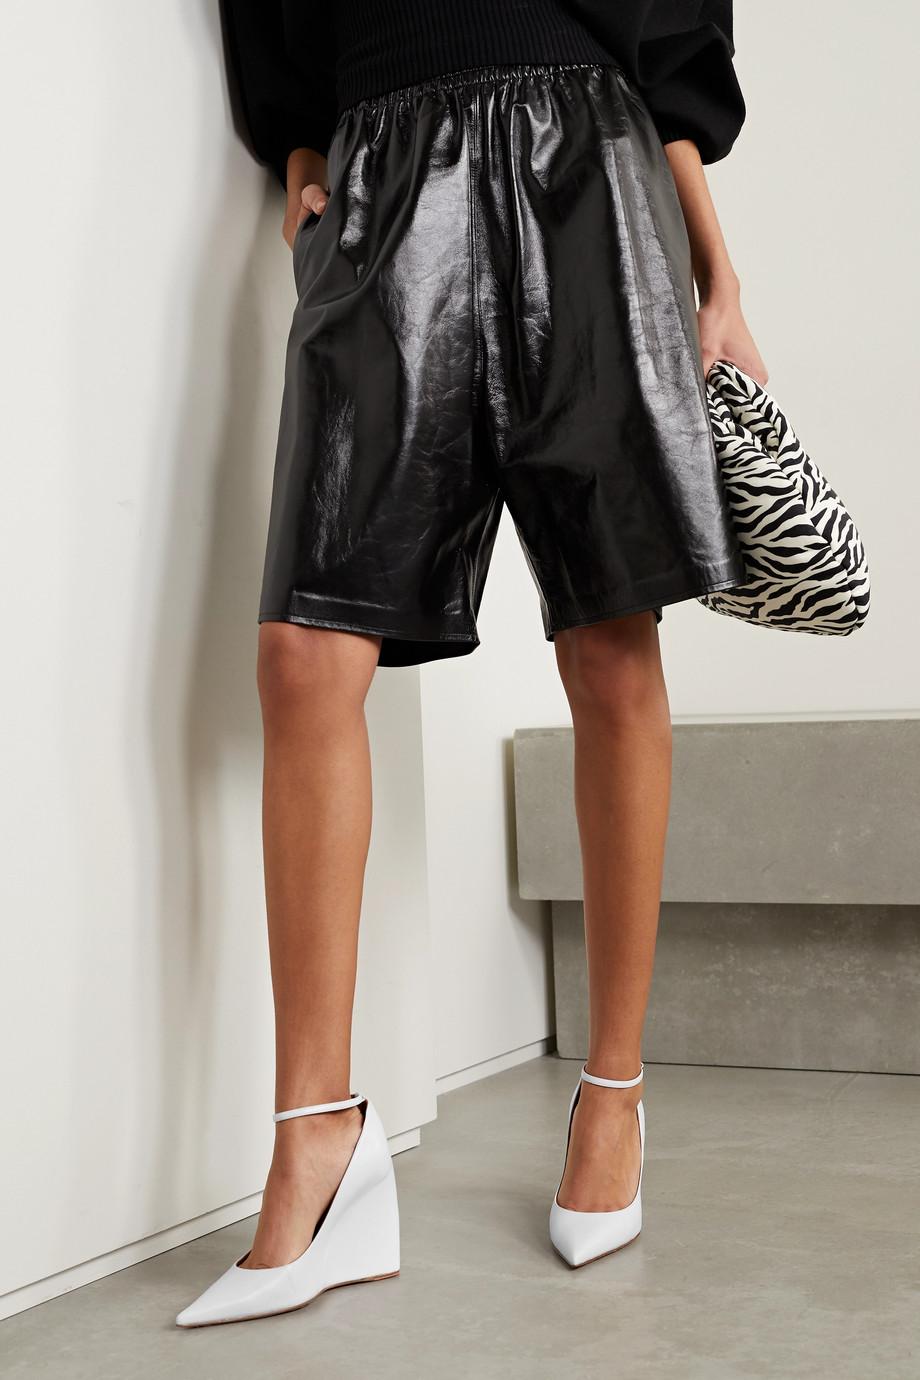 Amina Muaddi Pernille leather wedge pumps